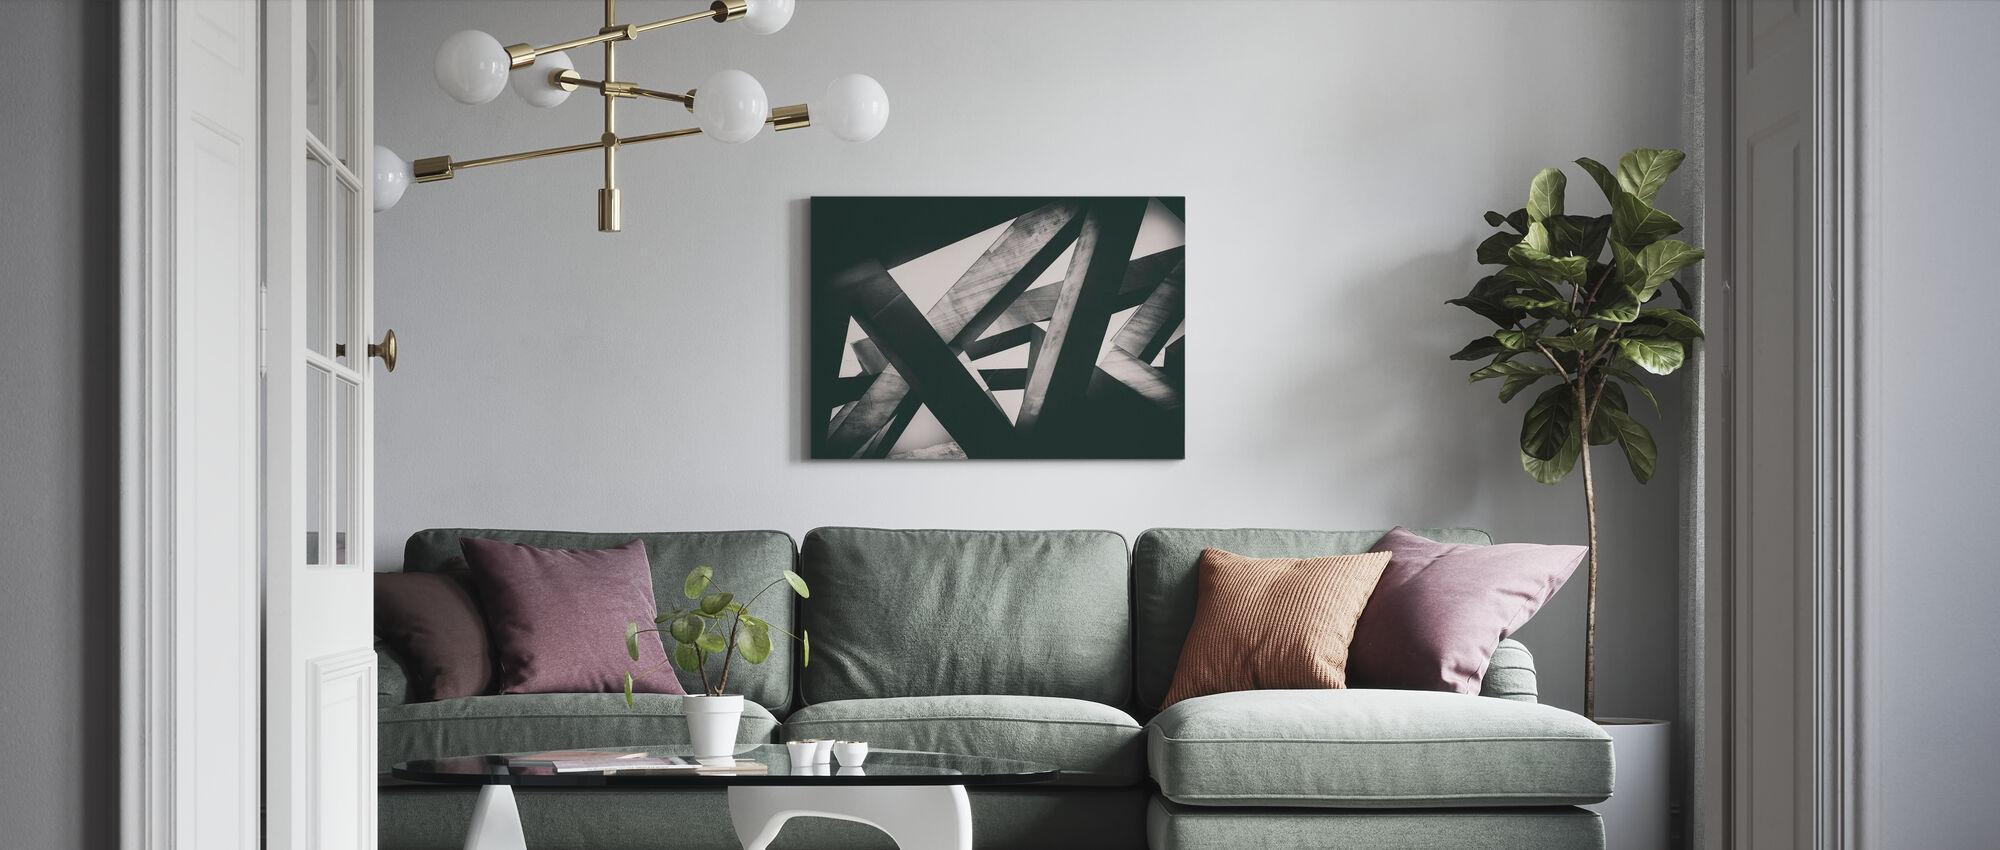 Concrete Pillars - Canvas print - Living Room